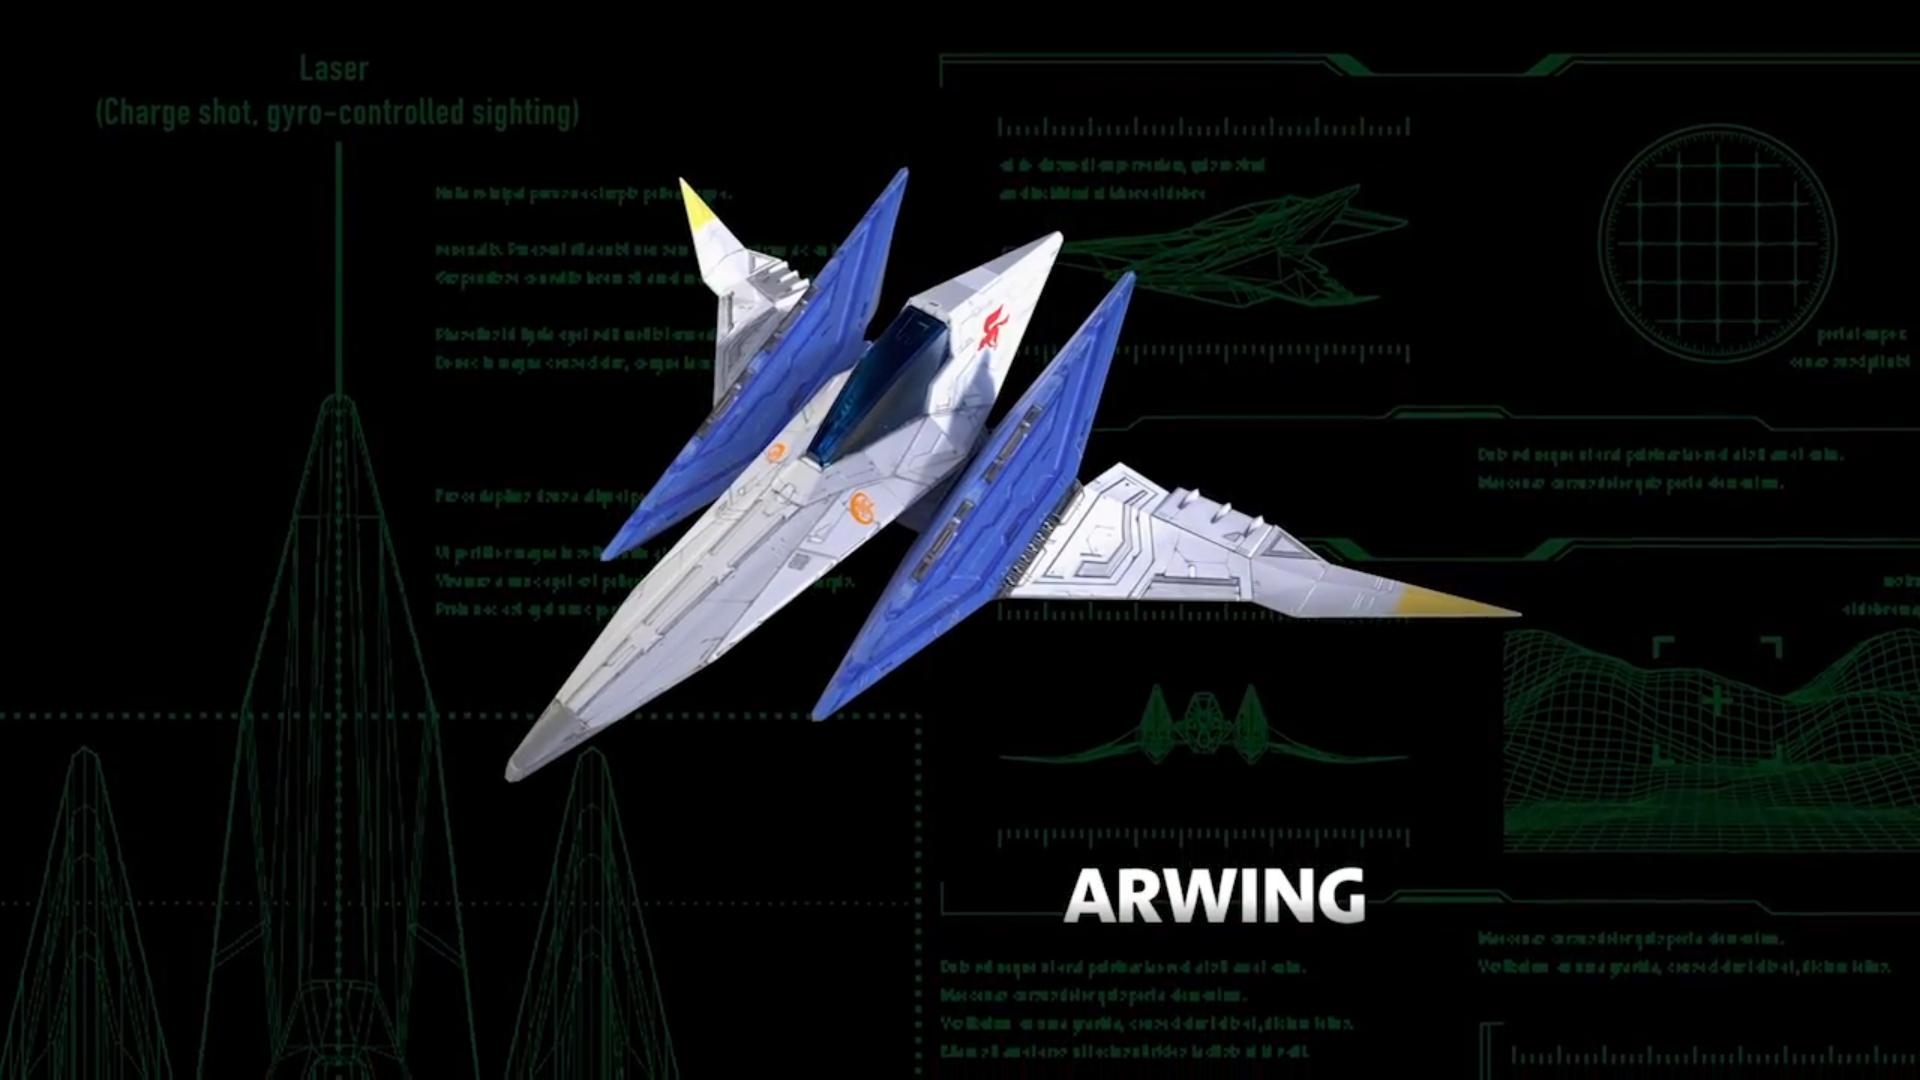 13 - Vehicle Arwing.png